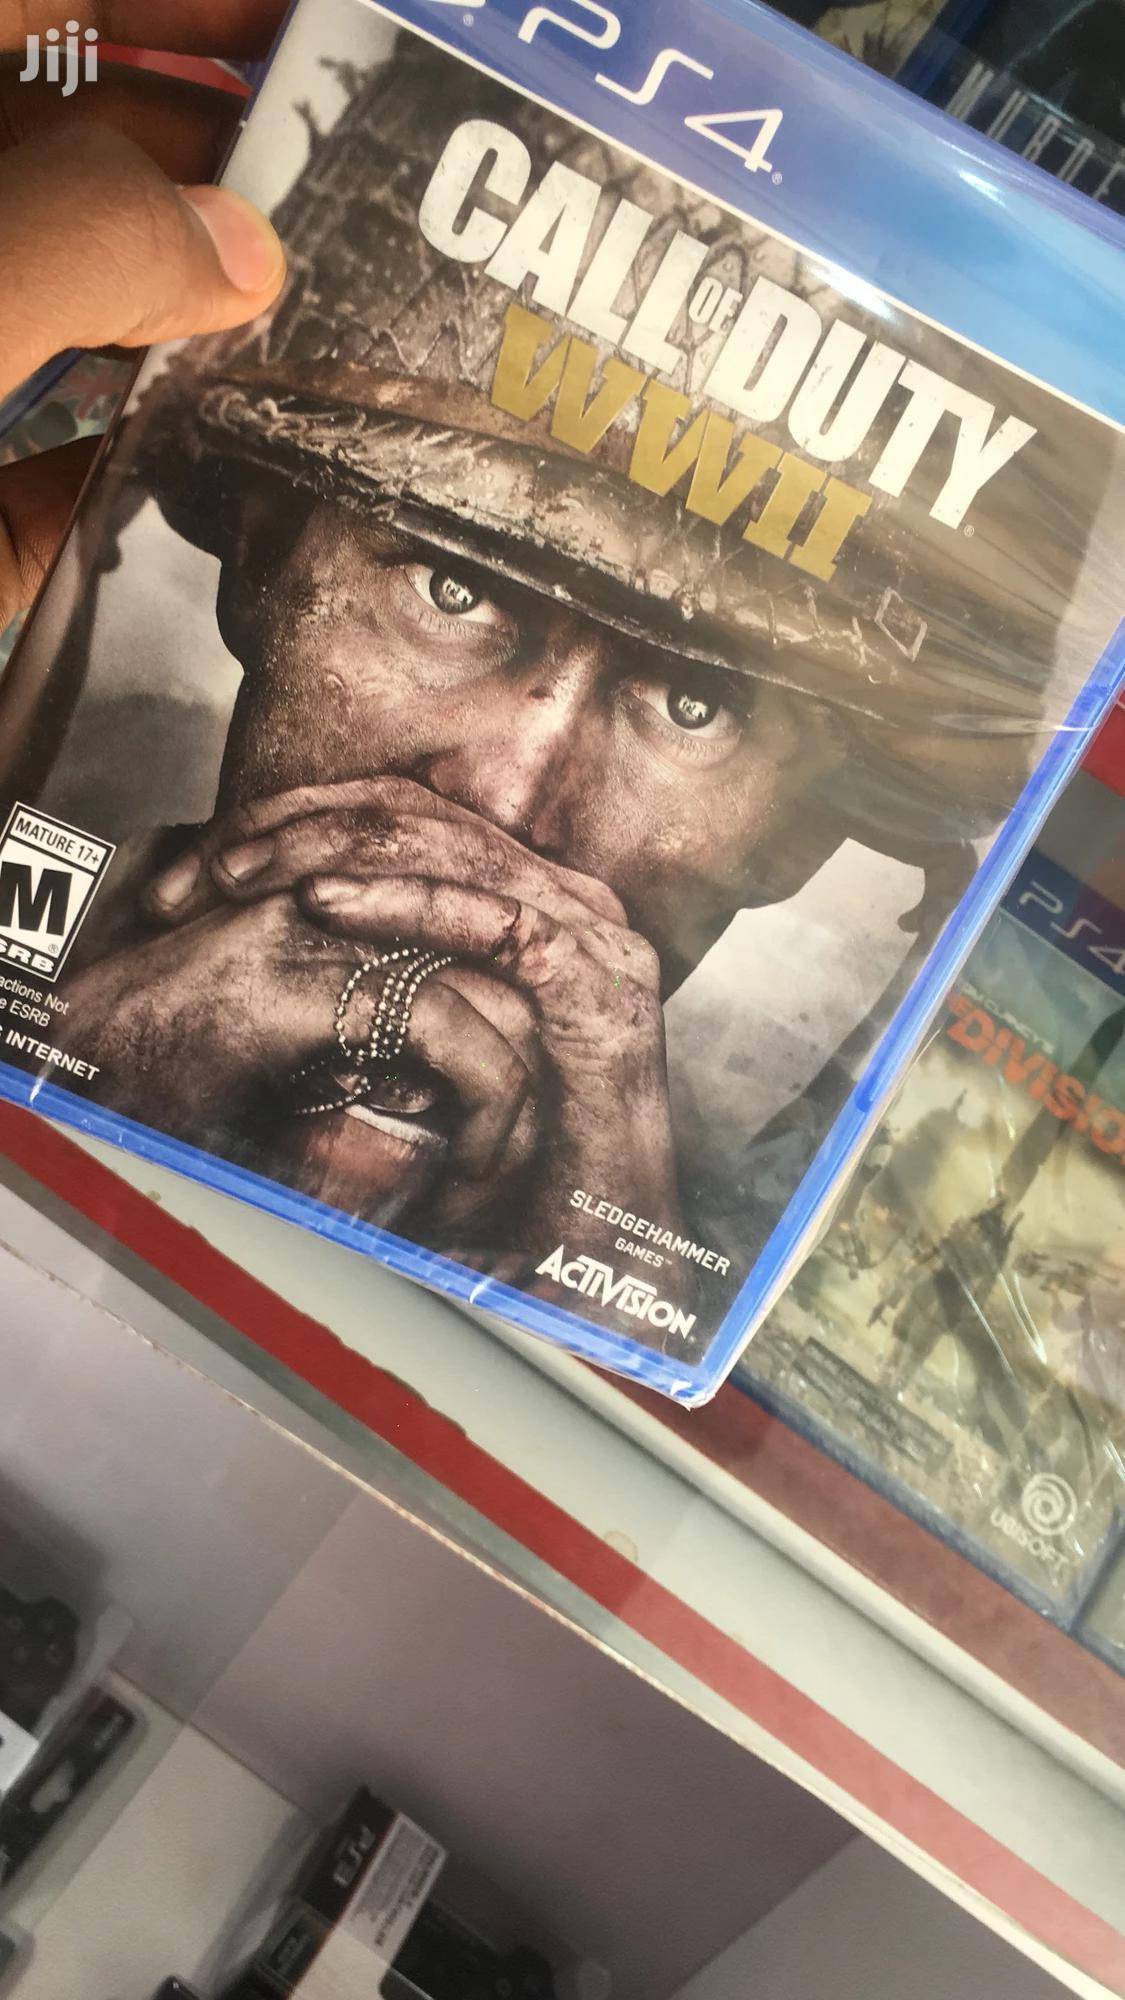 Sony Playstation 4 Games | Video Games for sale in Kampala, Central Region, Uganda